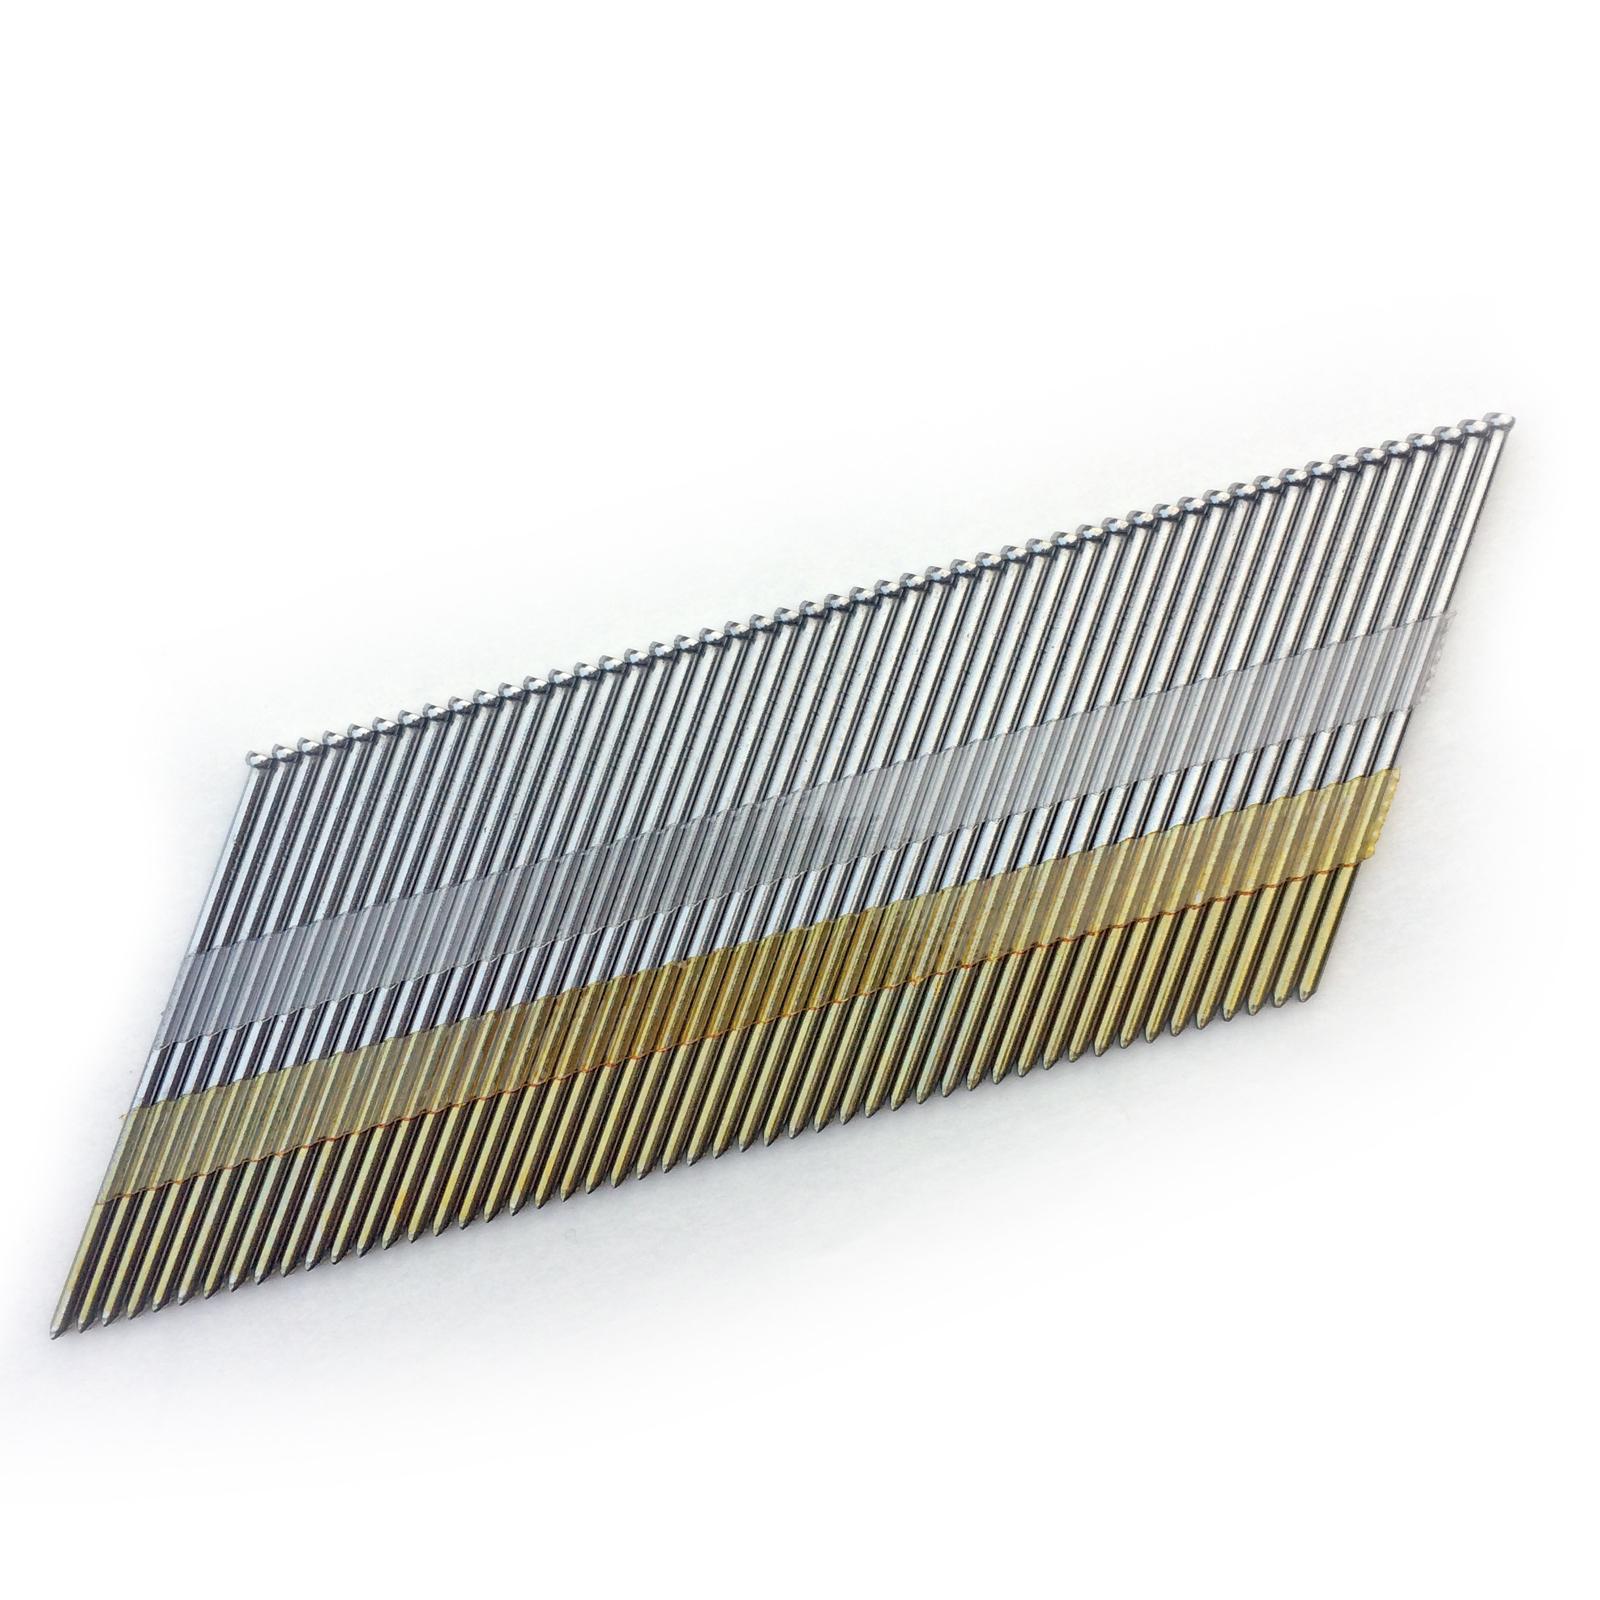 Angle Finish Stainless Steel (Da)